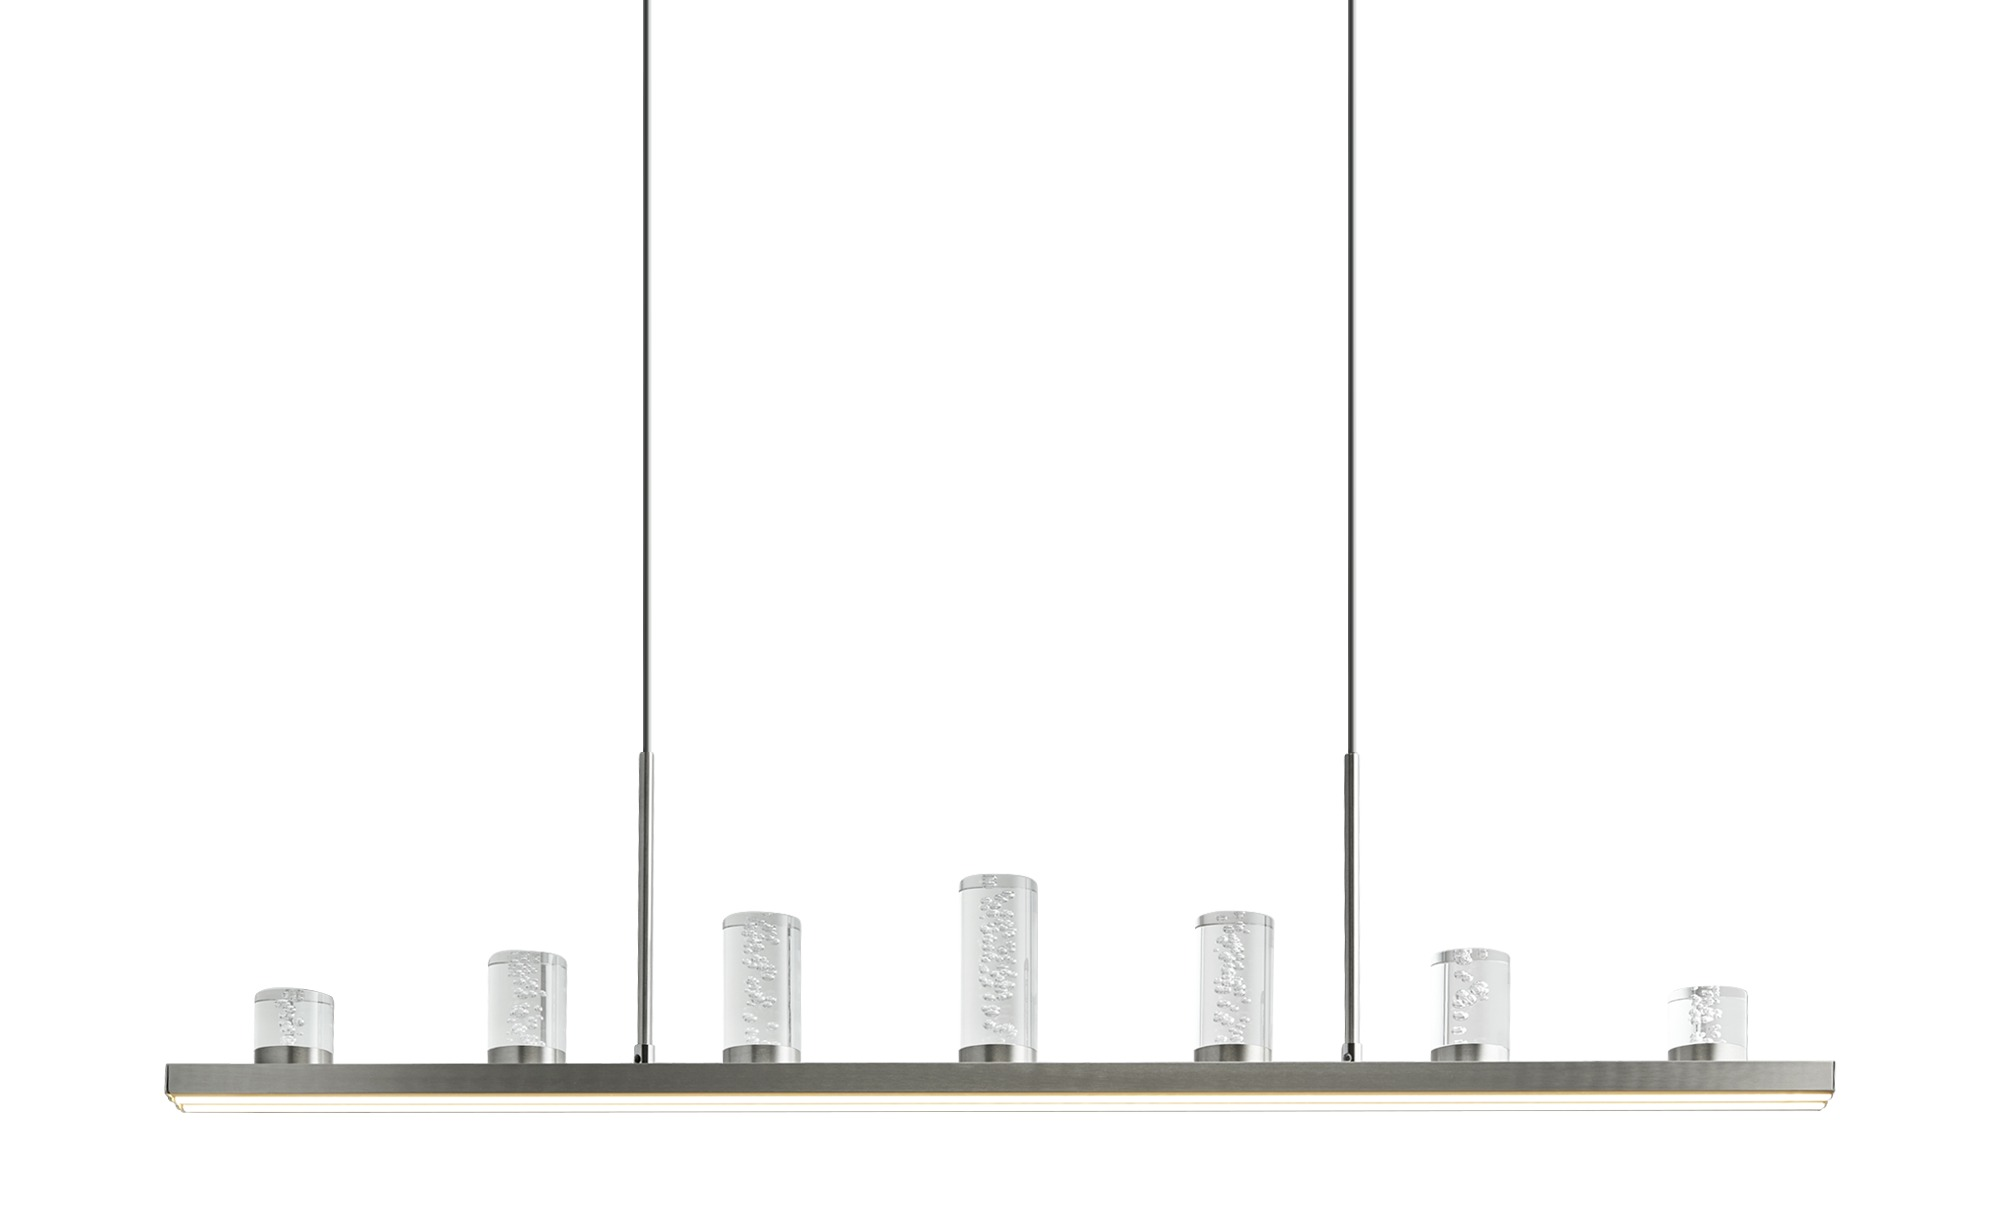 KHG LED-Pendelleuchte mit Fernbedienung ¦ silber ¦ Maße (cm): B: 8 H: 120 Lampen & Leuchten > LED-Leuchten > LED-Pendelleuchten - Höffner